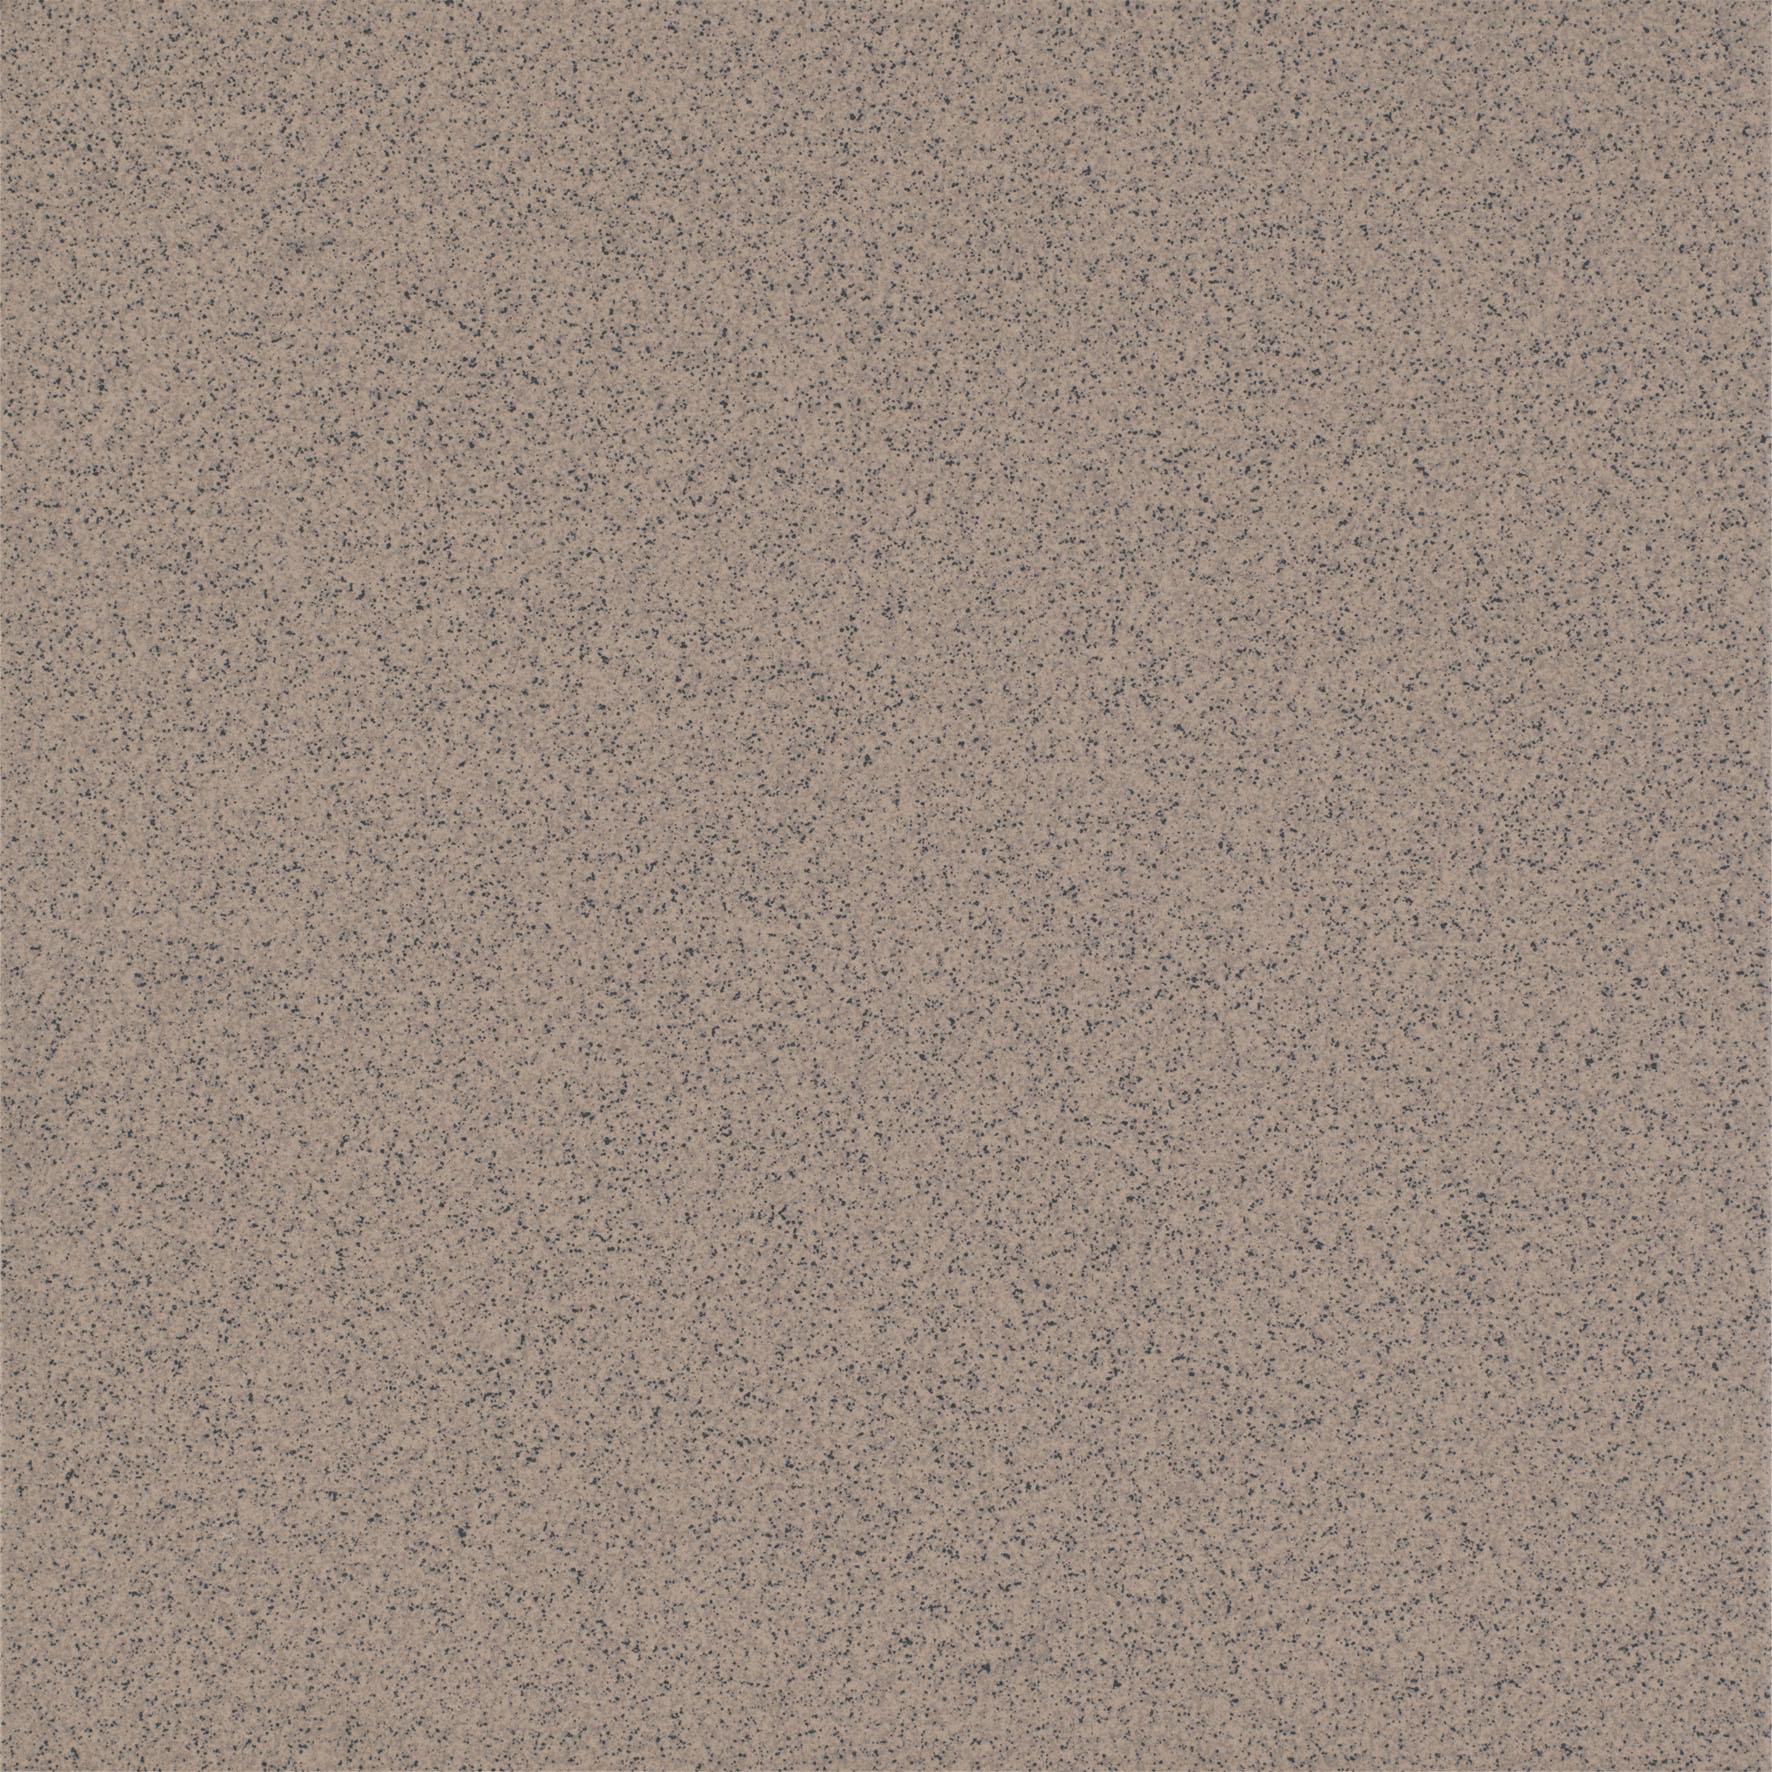 HX200 grey W334-004-1 R10 29,7x29,7x0,7 - Hansas Plaadimaailm